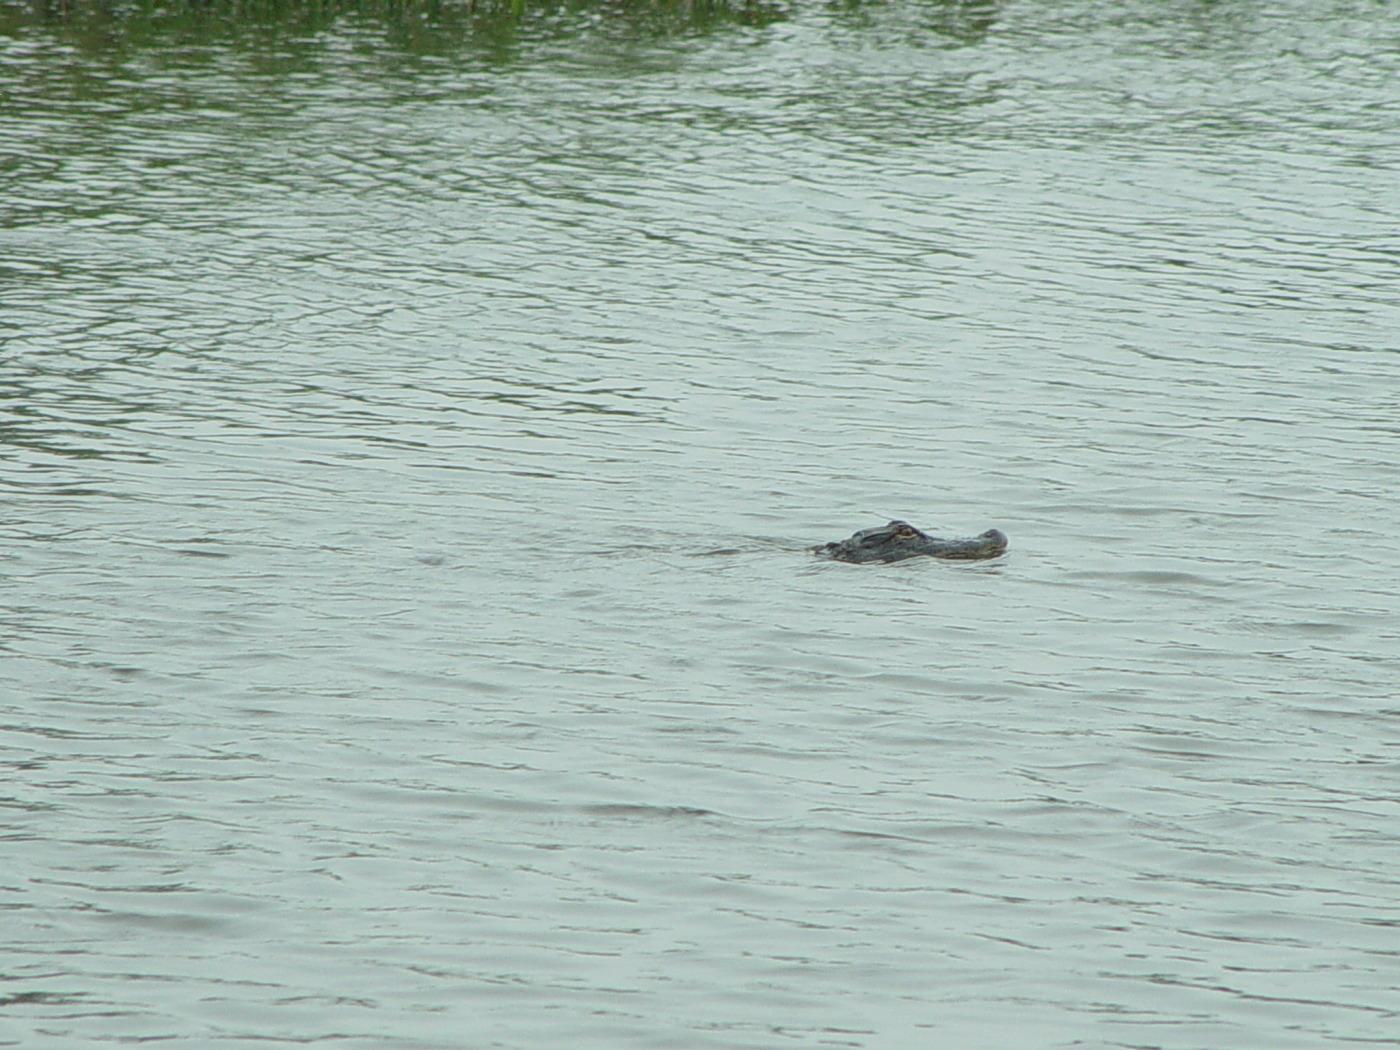 Alligator Watch while Surveying